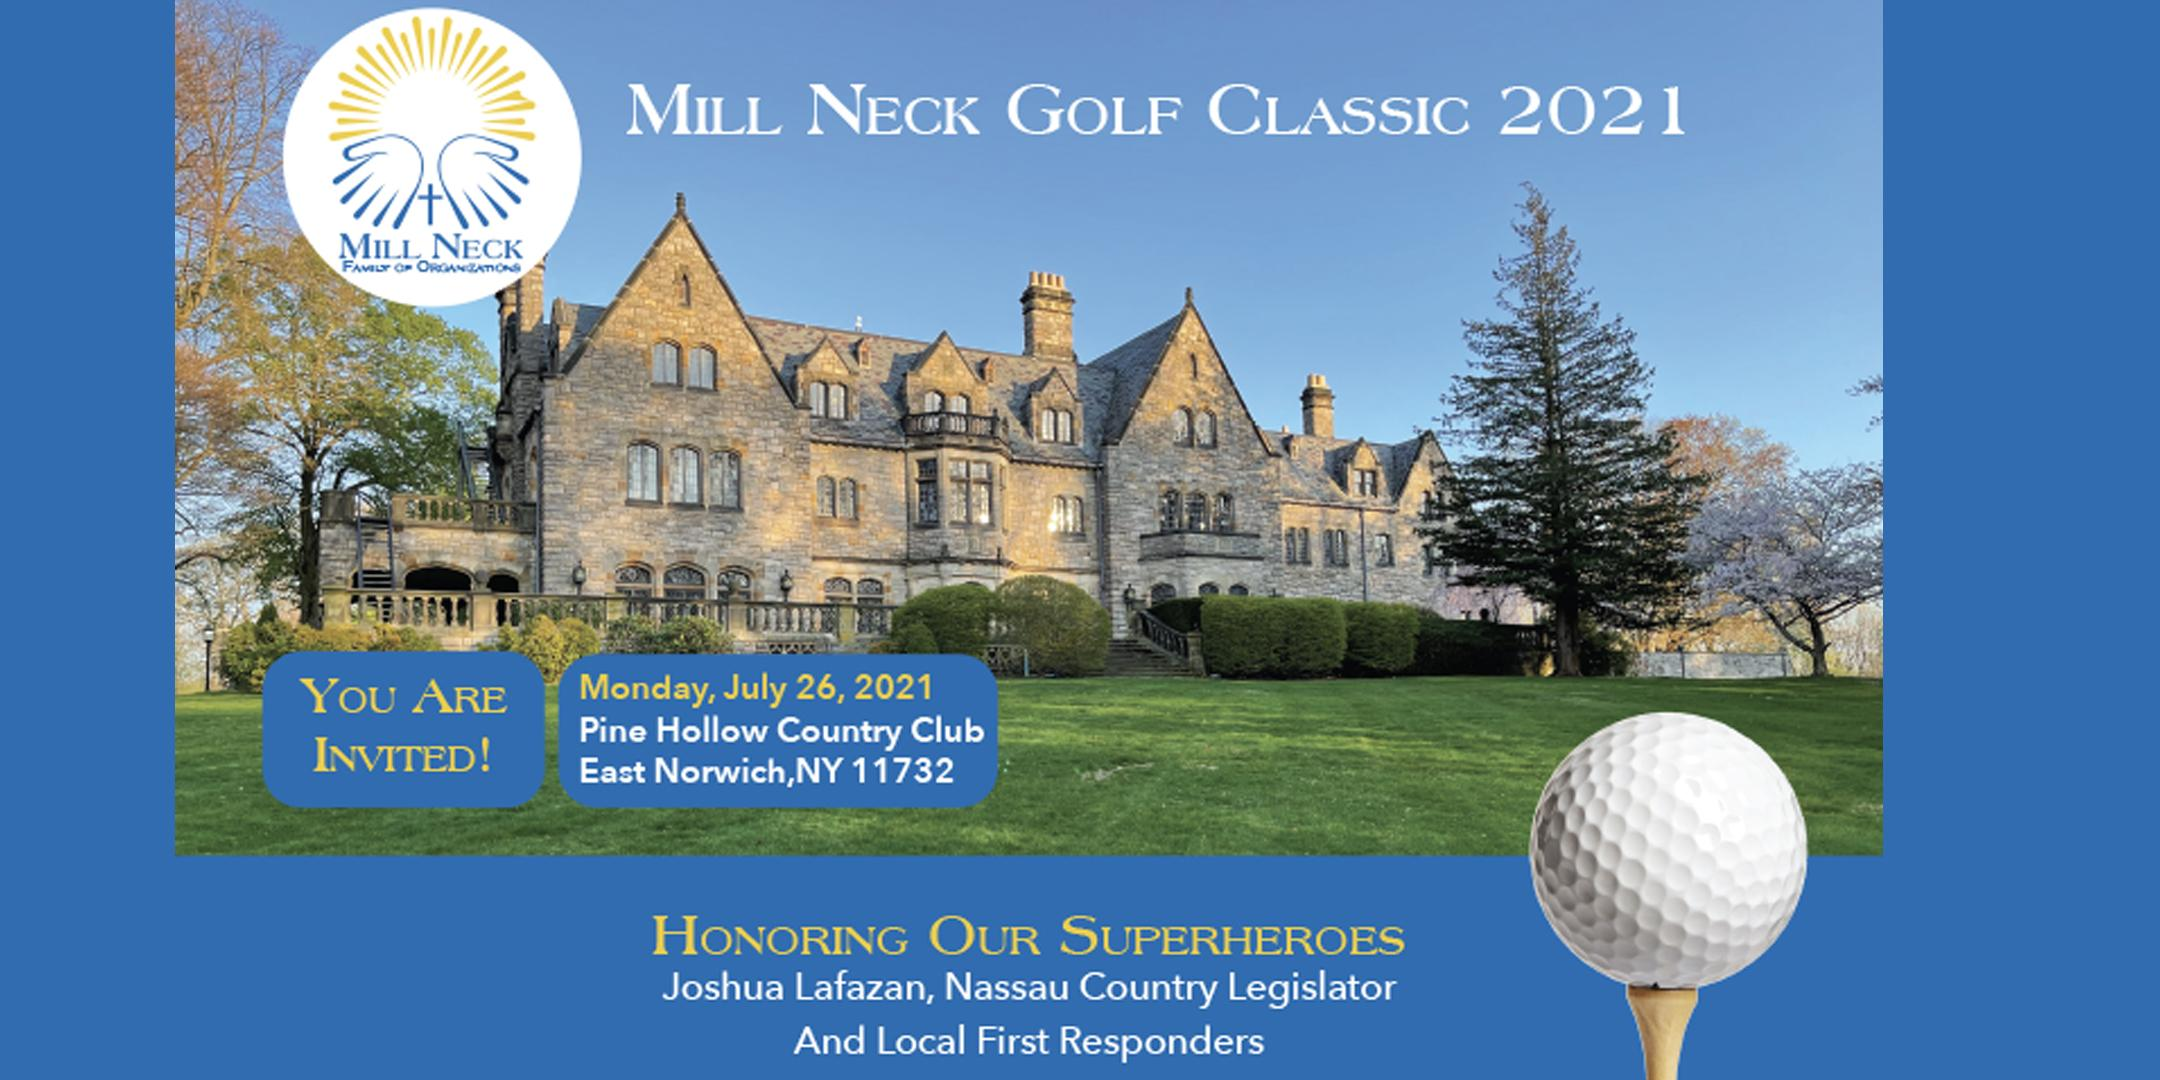 Mill Neck Golf Classic 2021